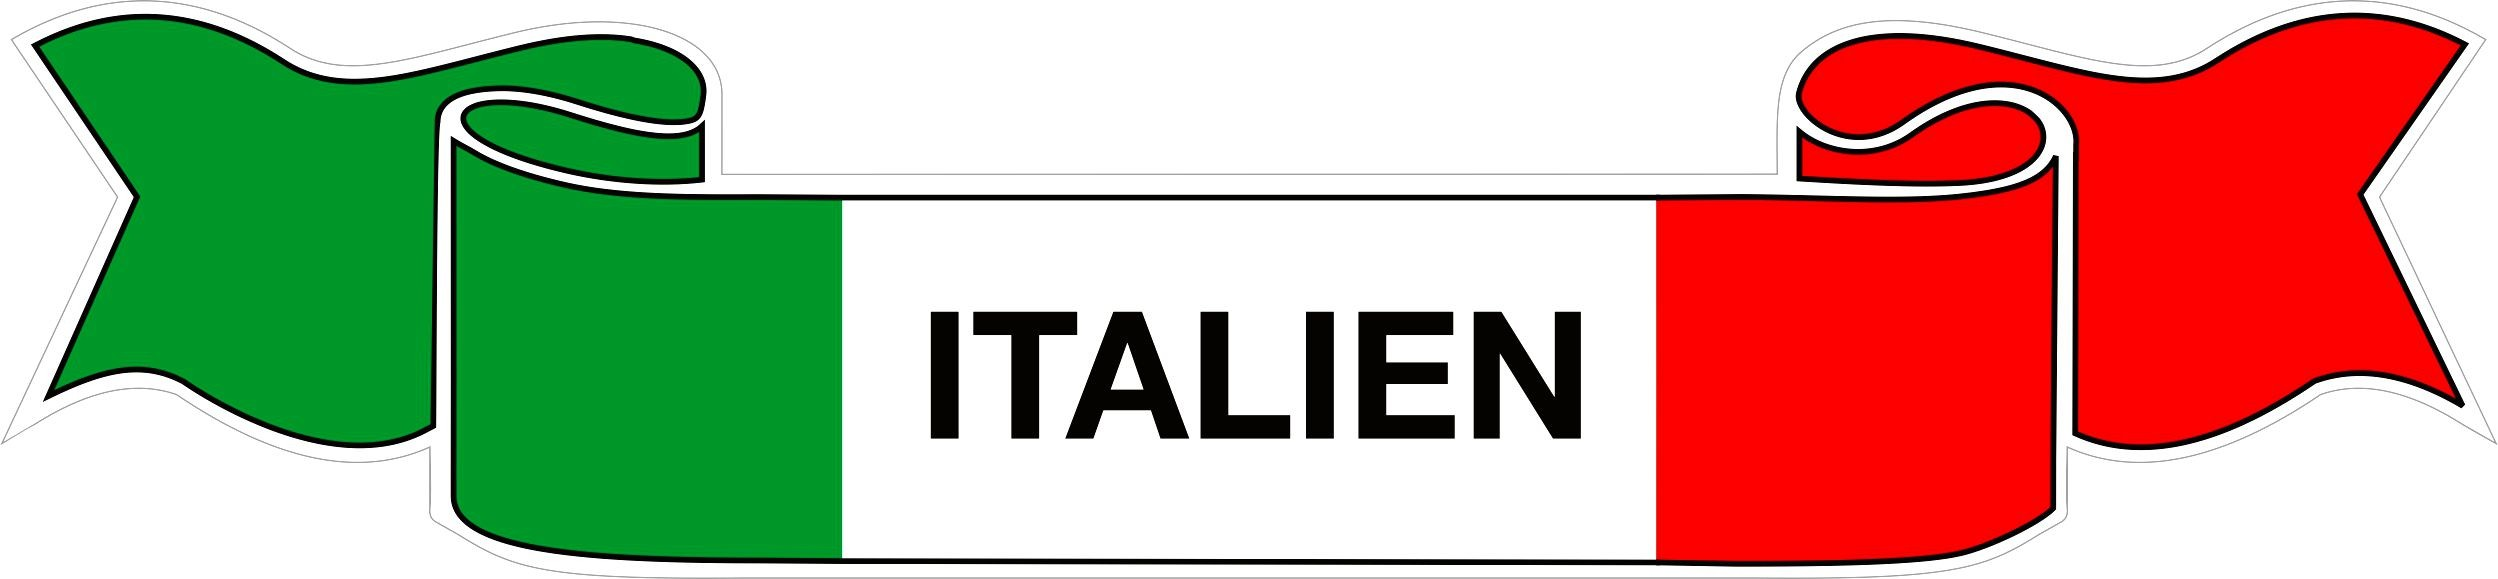 Aufkleber Flagge Italien 35 x 150 mm Deutschland Fanartikel Olympia – Bild 1